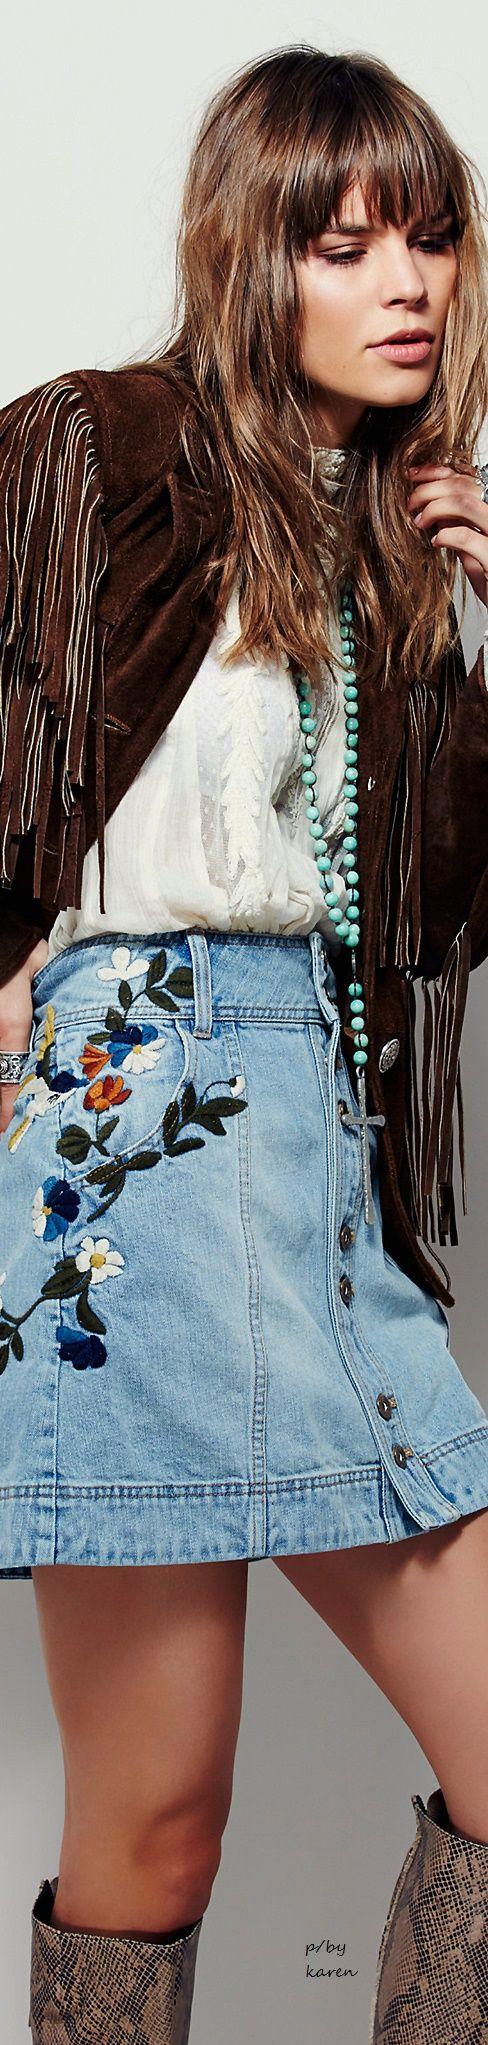 Embroidered Denim Skirt - Free People